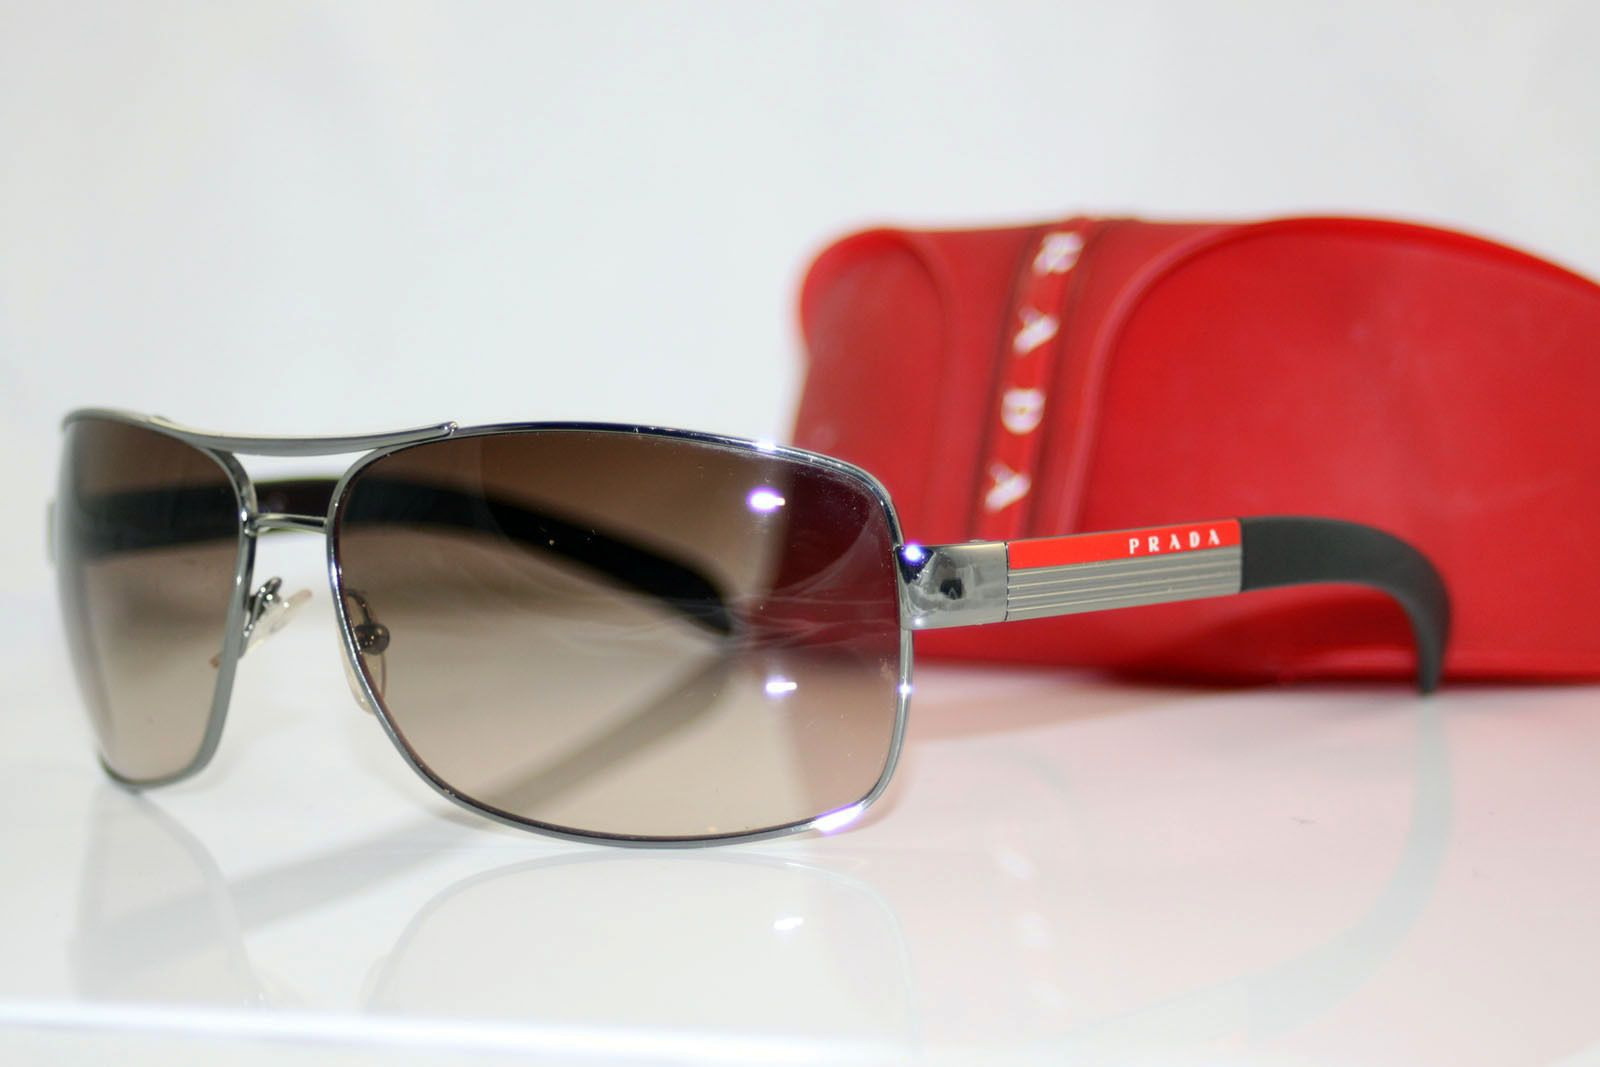 0554ac5237ca PRADA LINEA ROSSA Model SPS 54I (65-14 5AV-6S1 125 3N) | Eyewear ...